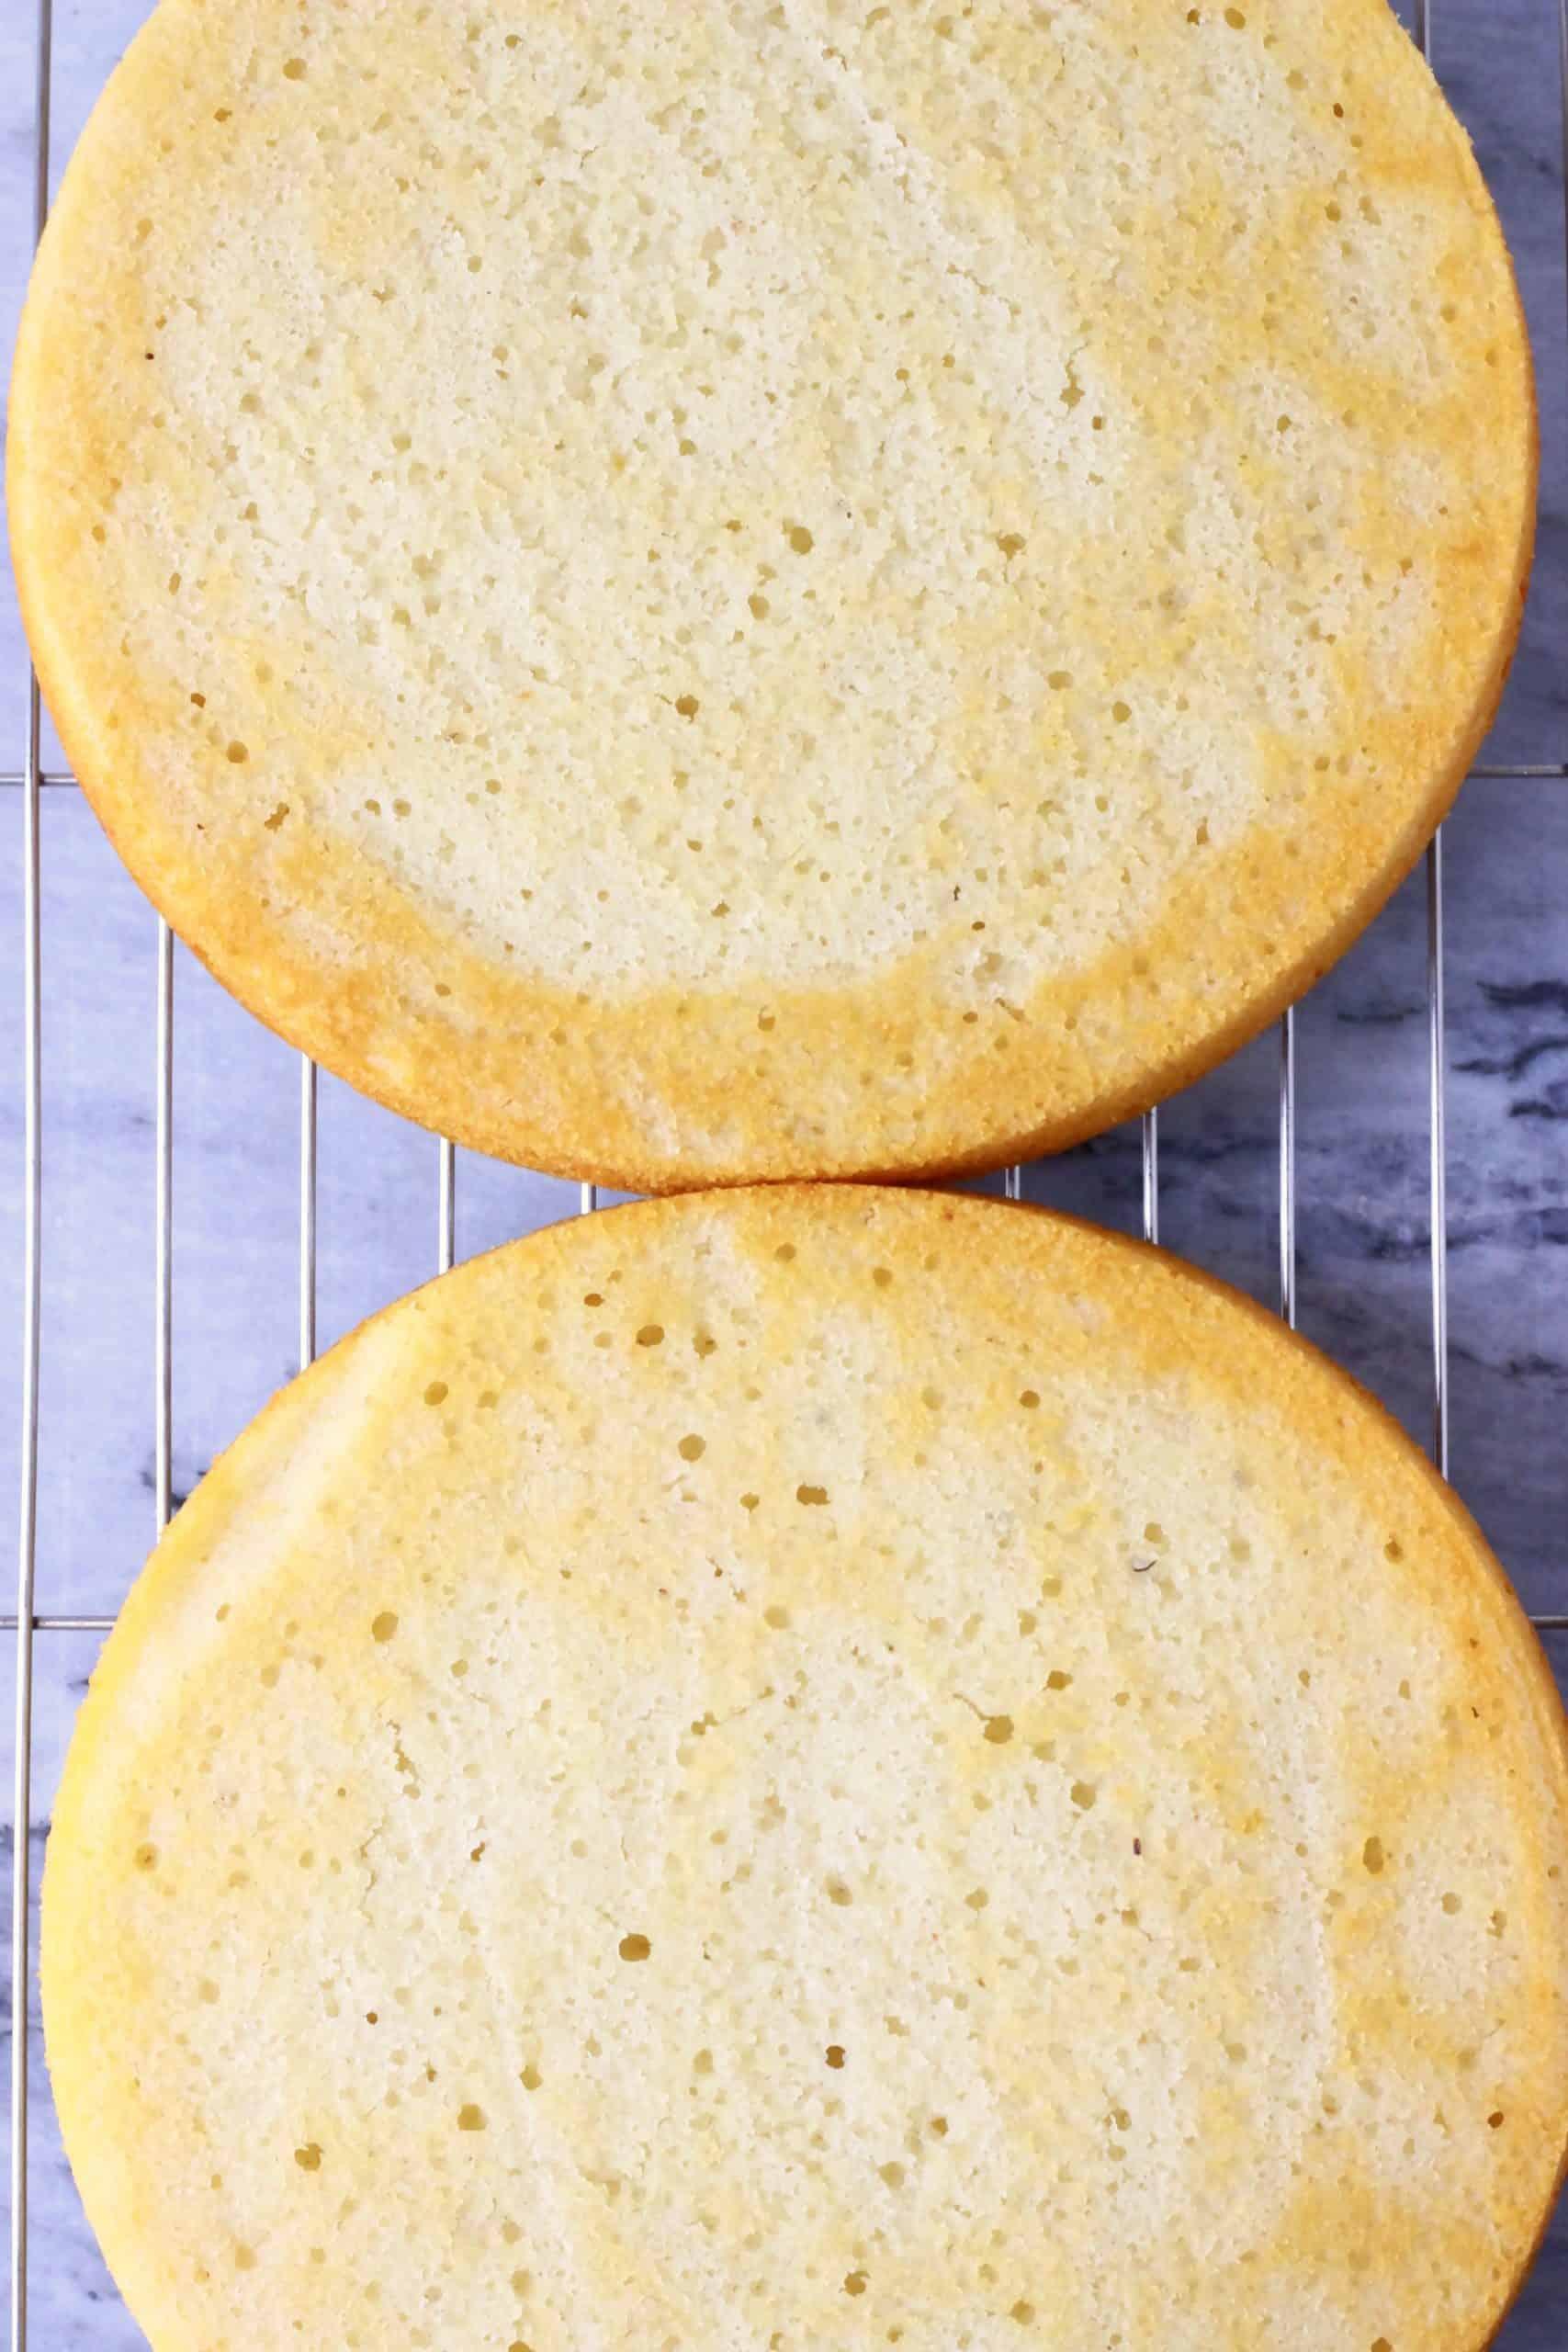 Two round gluten-free vegan vanilla cake sponges on a wire rack